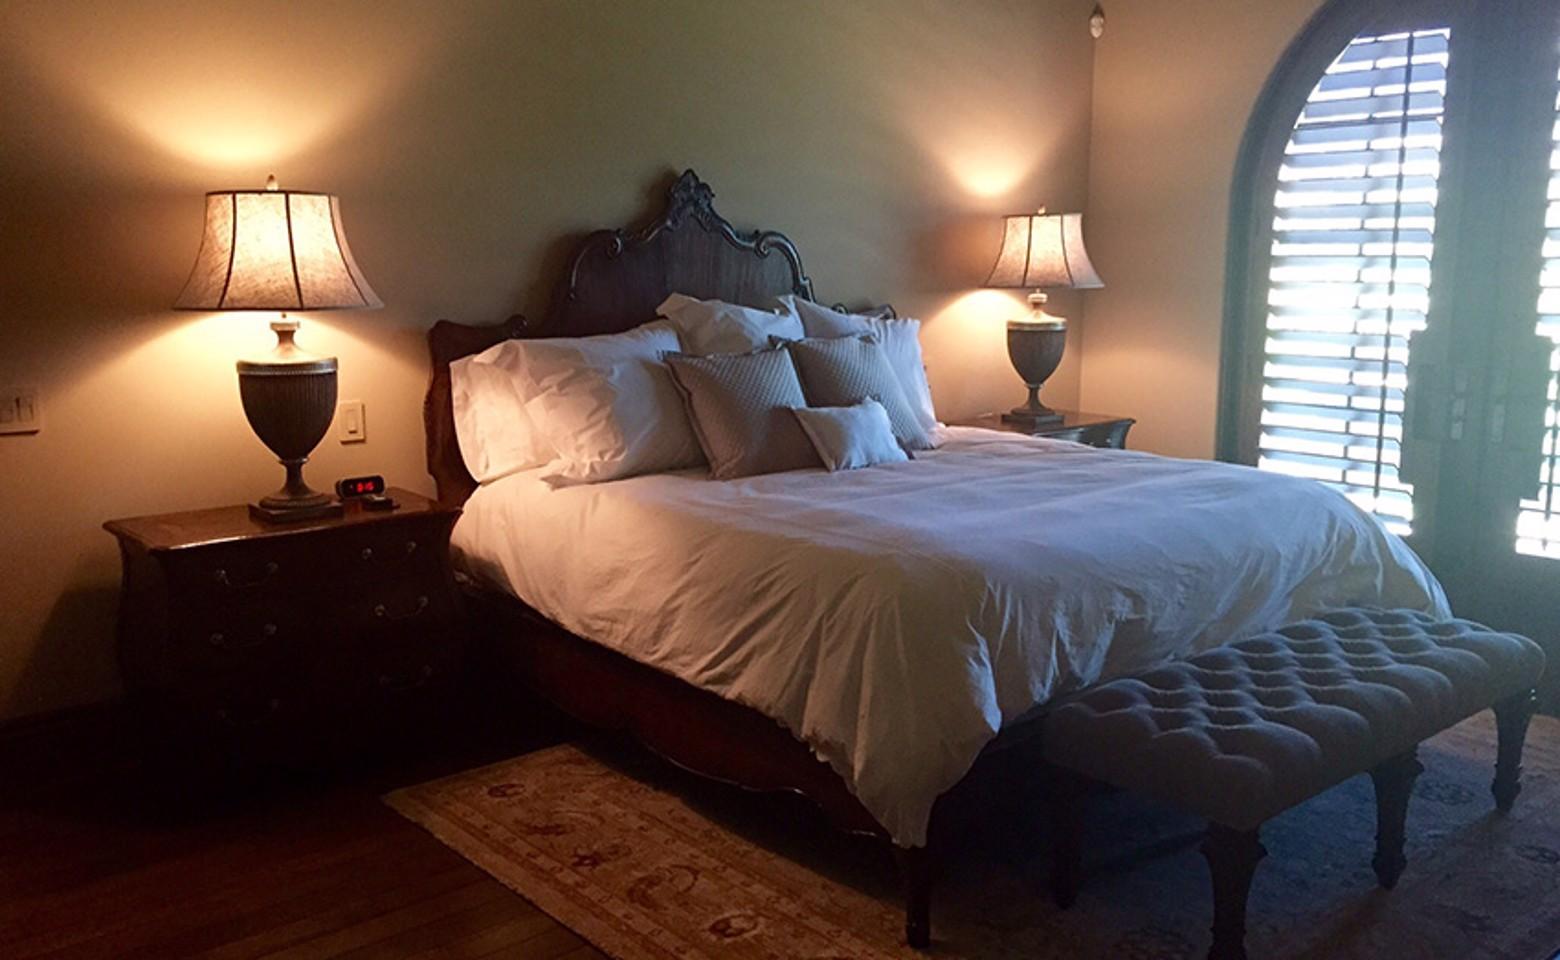 bedroom1_resized-1.jpg image